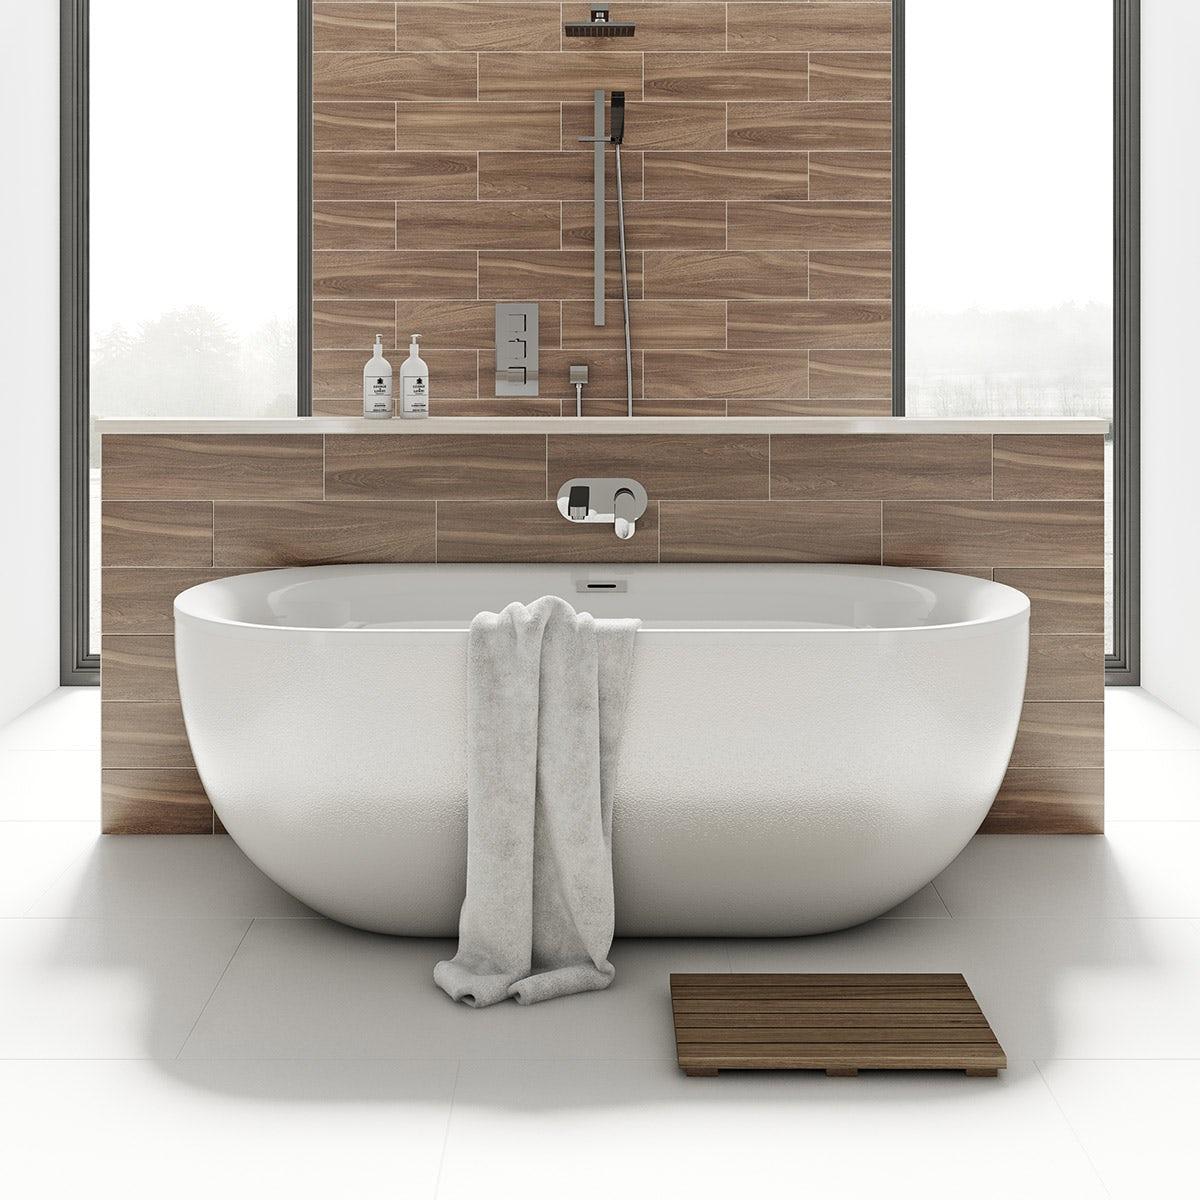 Mode ellis pearl coloured freestanding bath for Coloured free standing bath